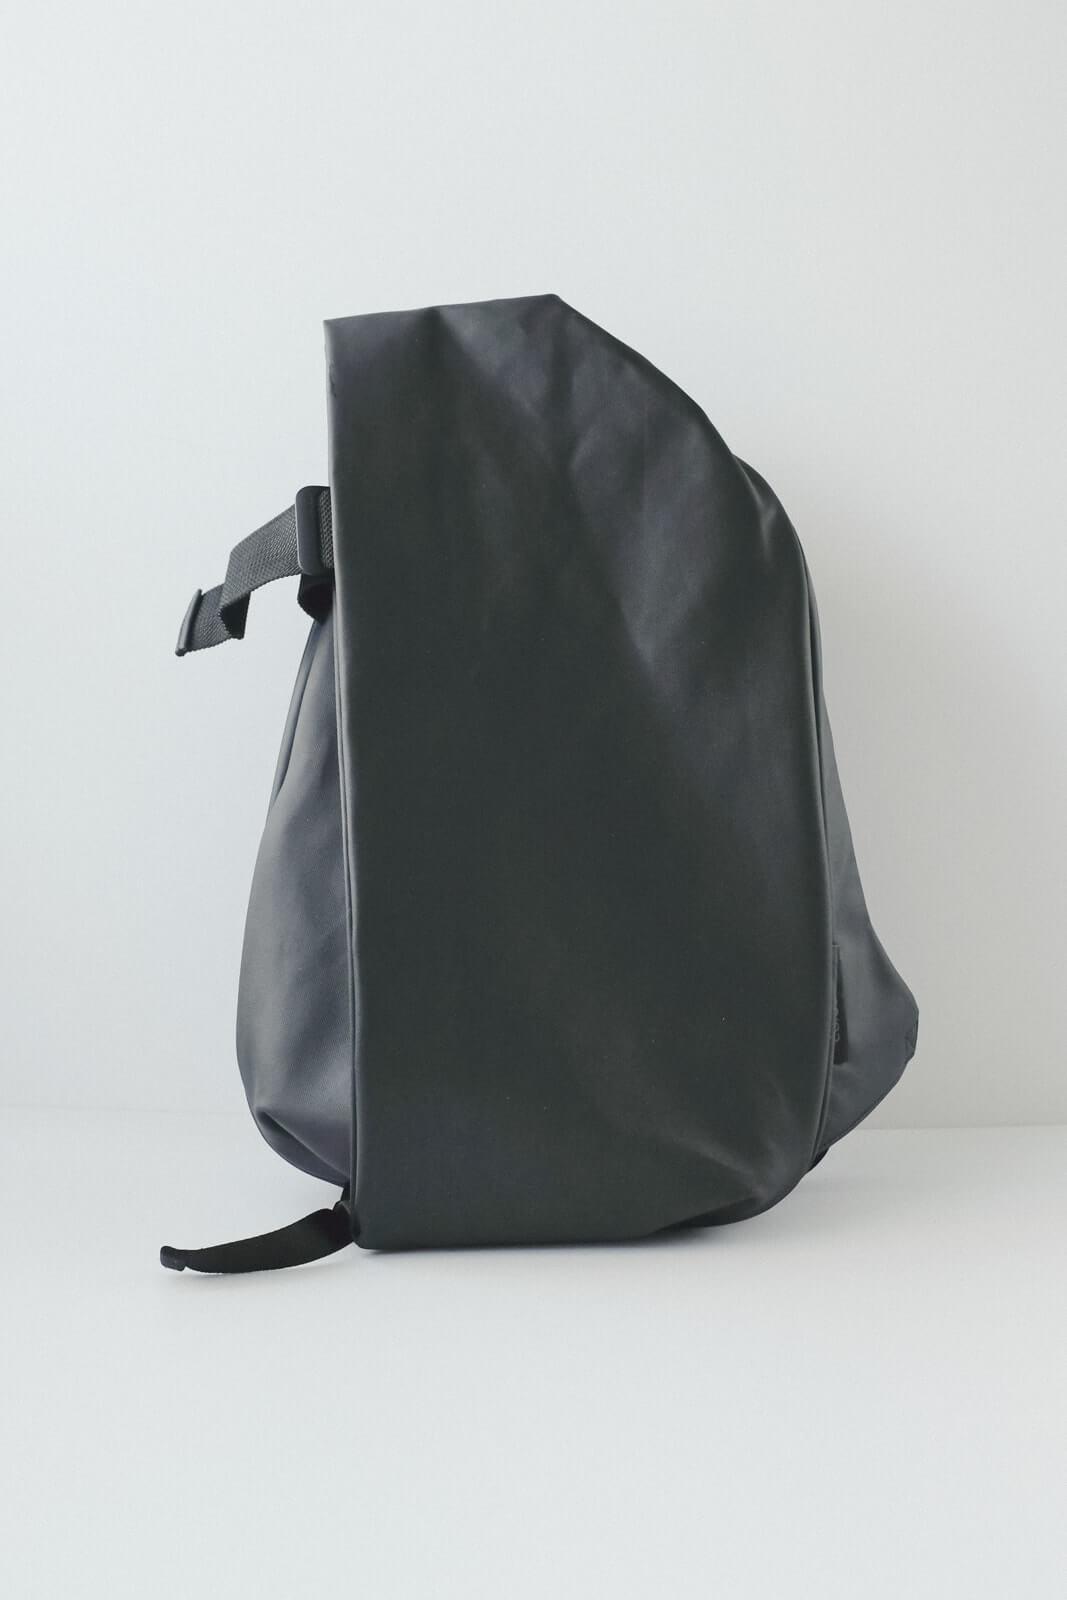 Cote & Ciel Isar Backpack review